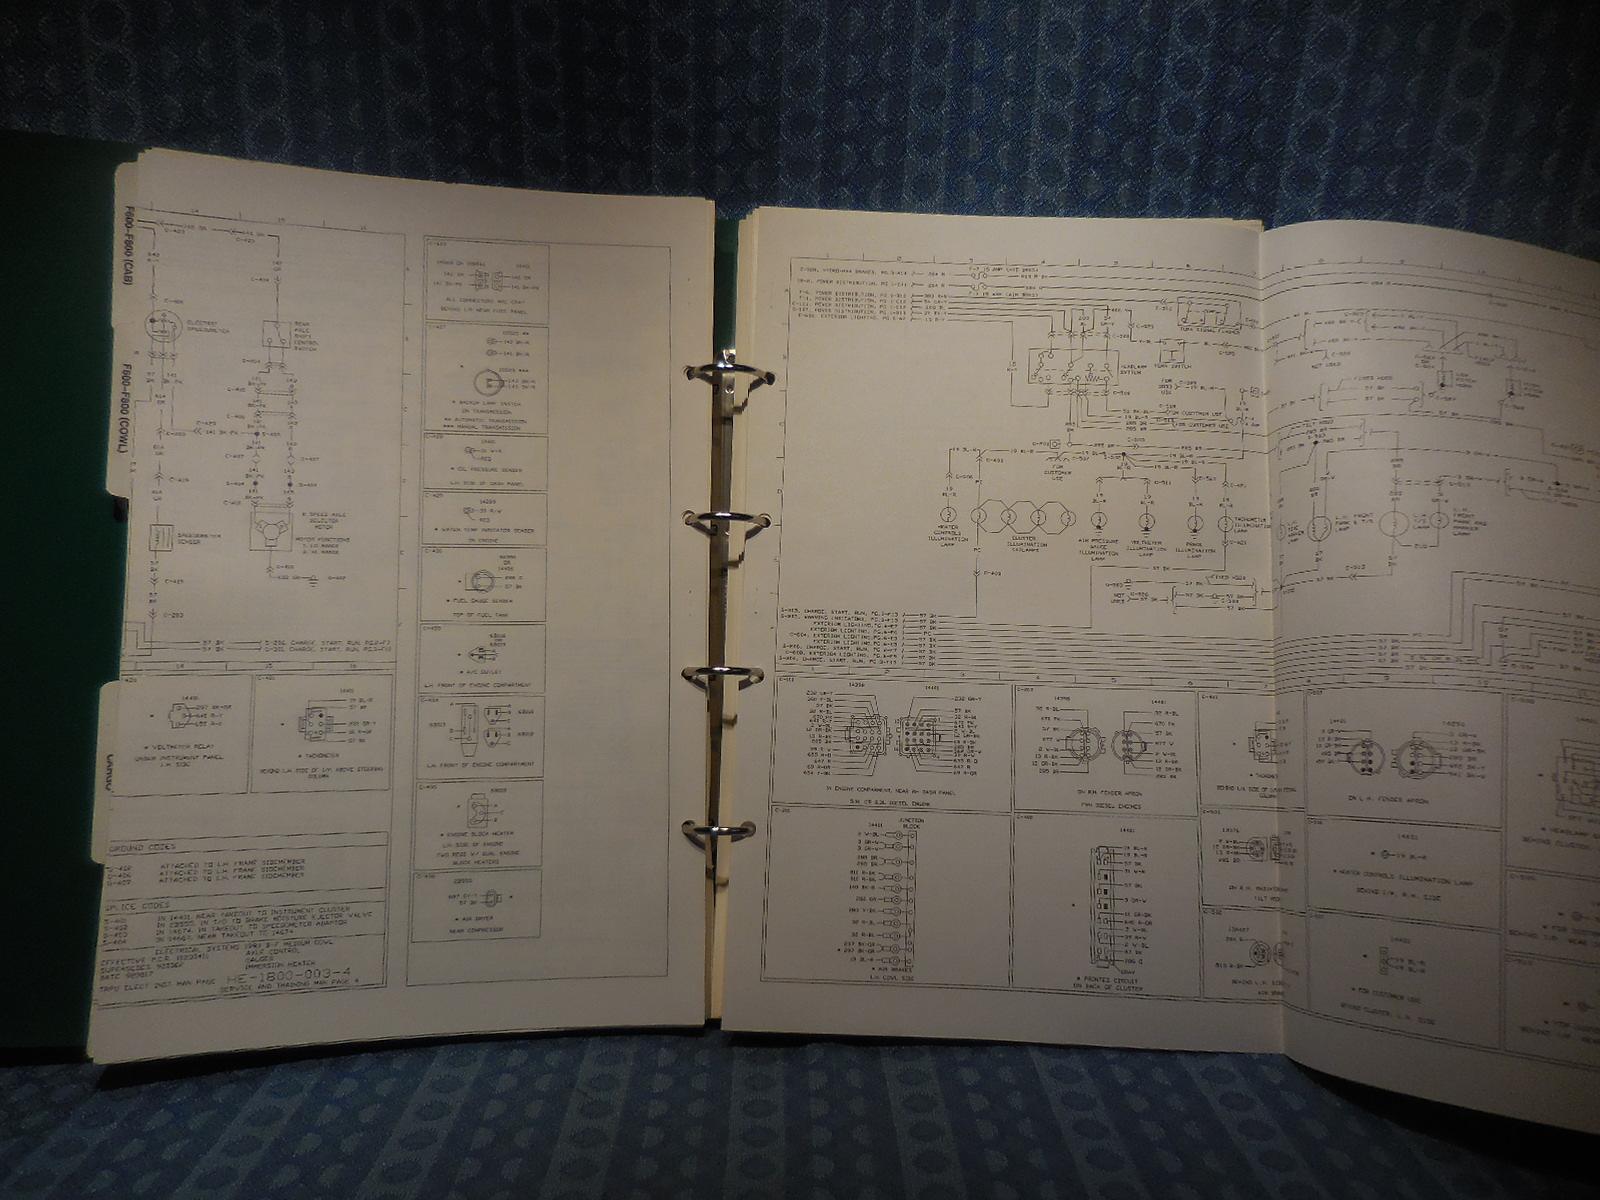 1993 Ford Truck Oem Wiring Diagrams F150 800 Ranger Econoline L Series Explorer Nos Texas Parts Llc Antique Auto Parts